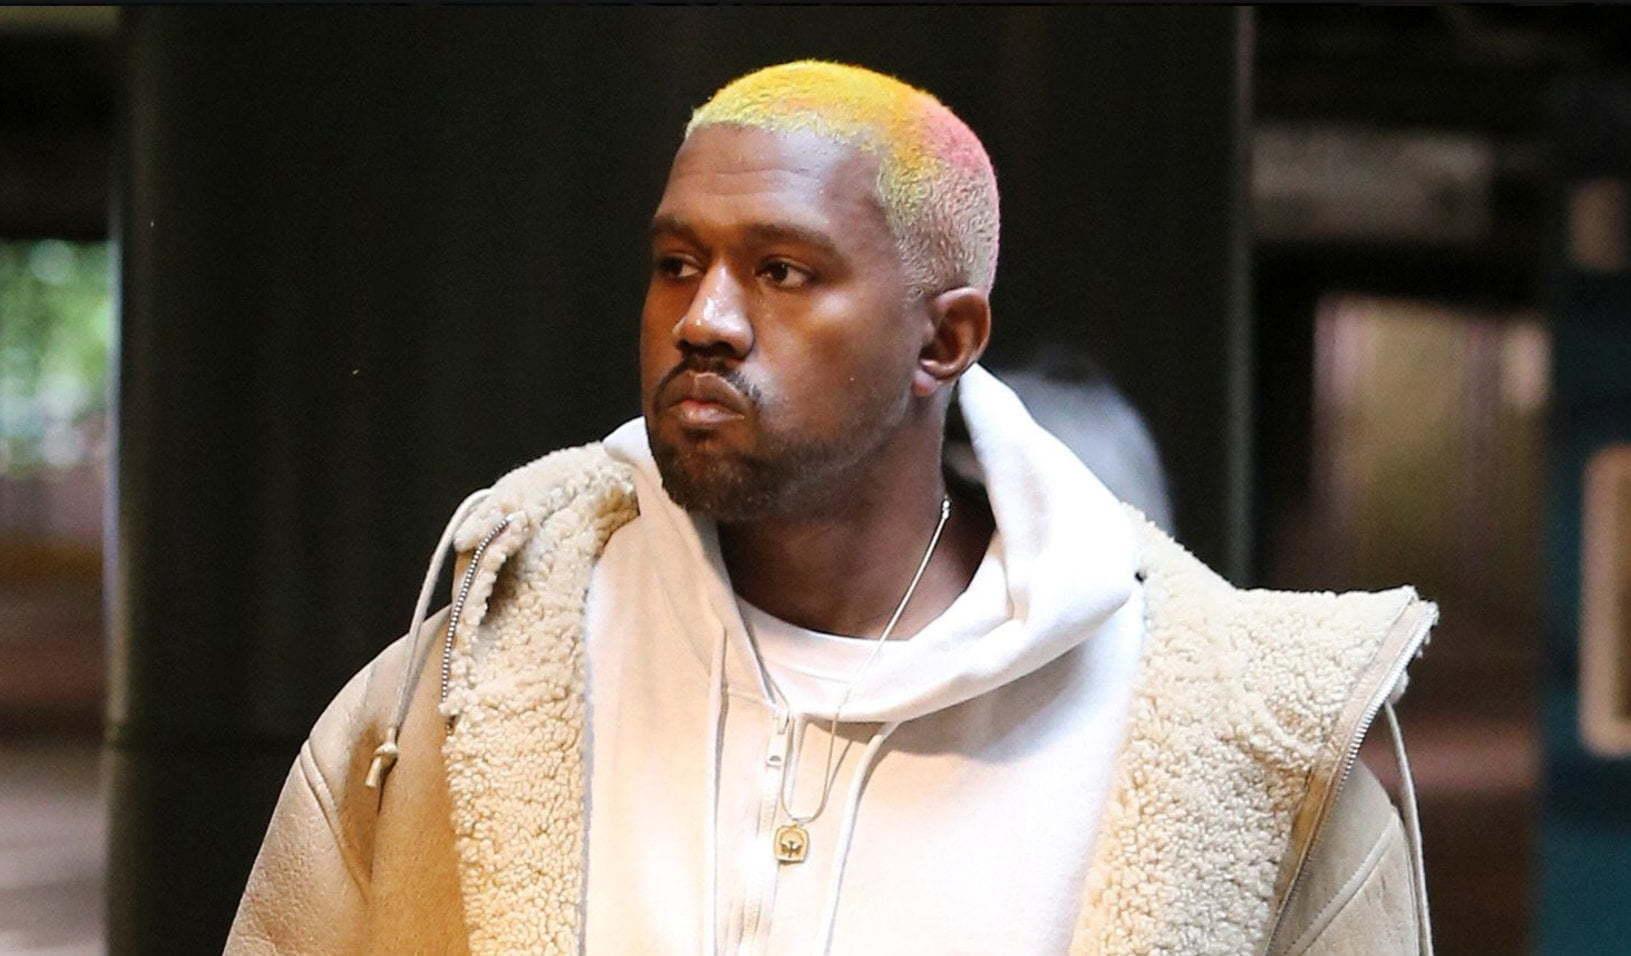 Tremendous Twitter Roast Kanye West For New Multi Colored Hairstyle Short Hairstyles Gunalazisus